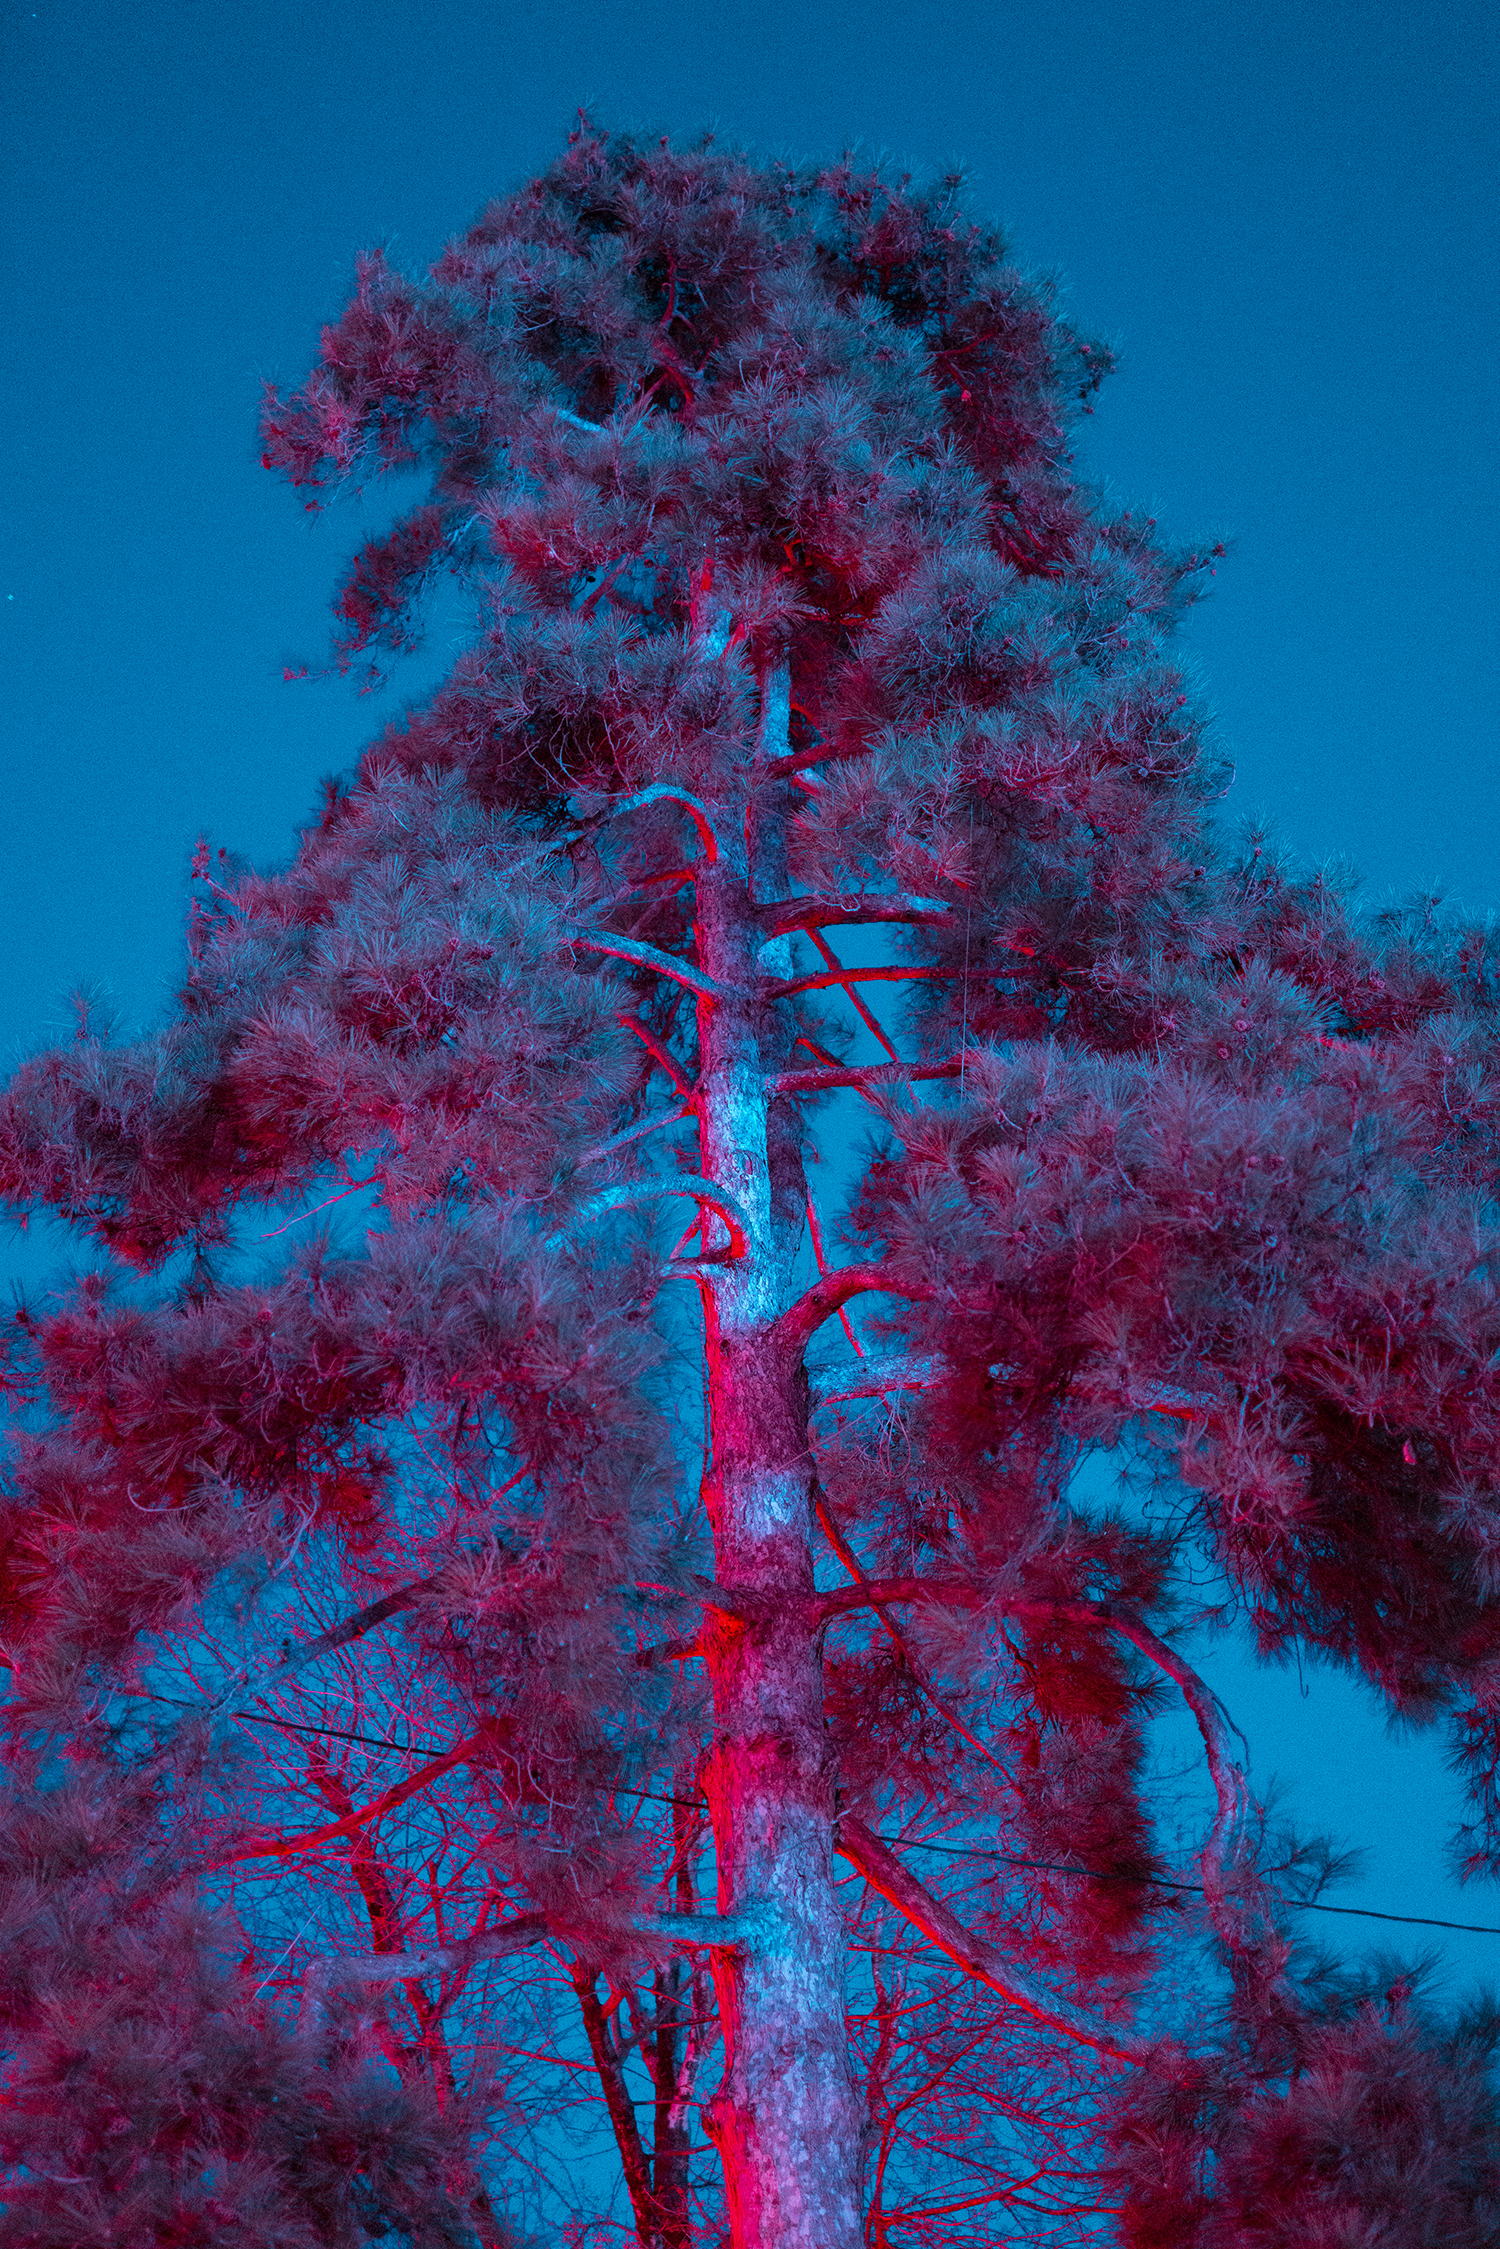 purple night up_17 1500.jpg